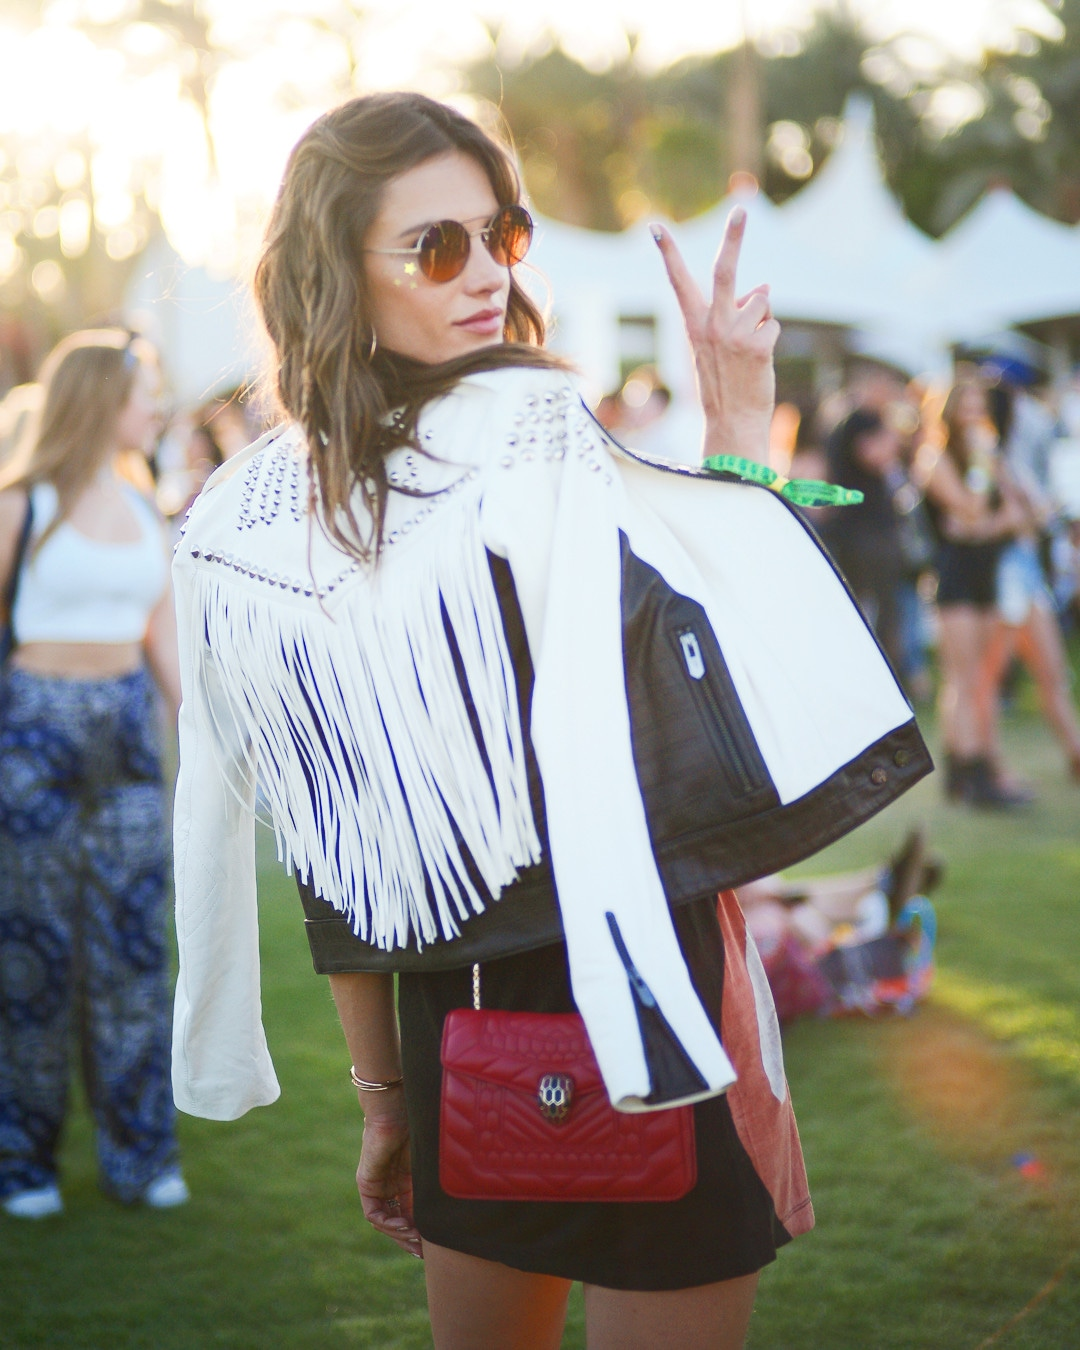 ESC: Alessandra Ambrosio, Coachella Beauty